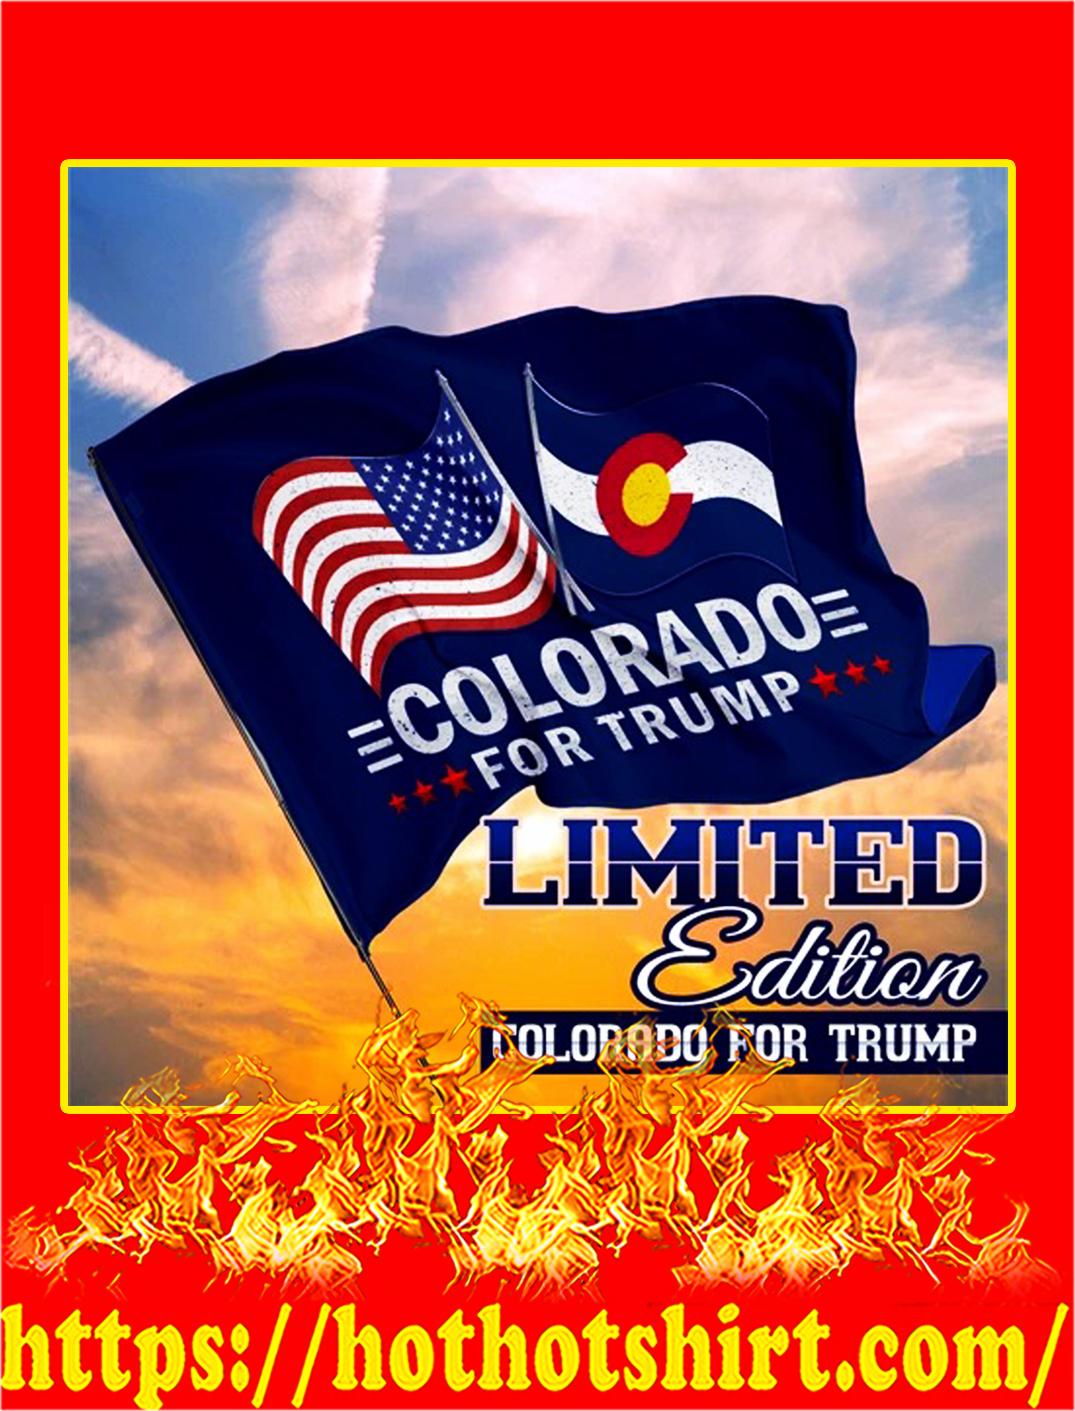 Colorado for trump flag - pic 1